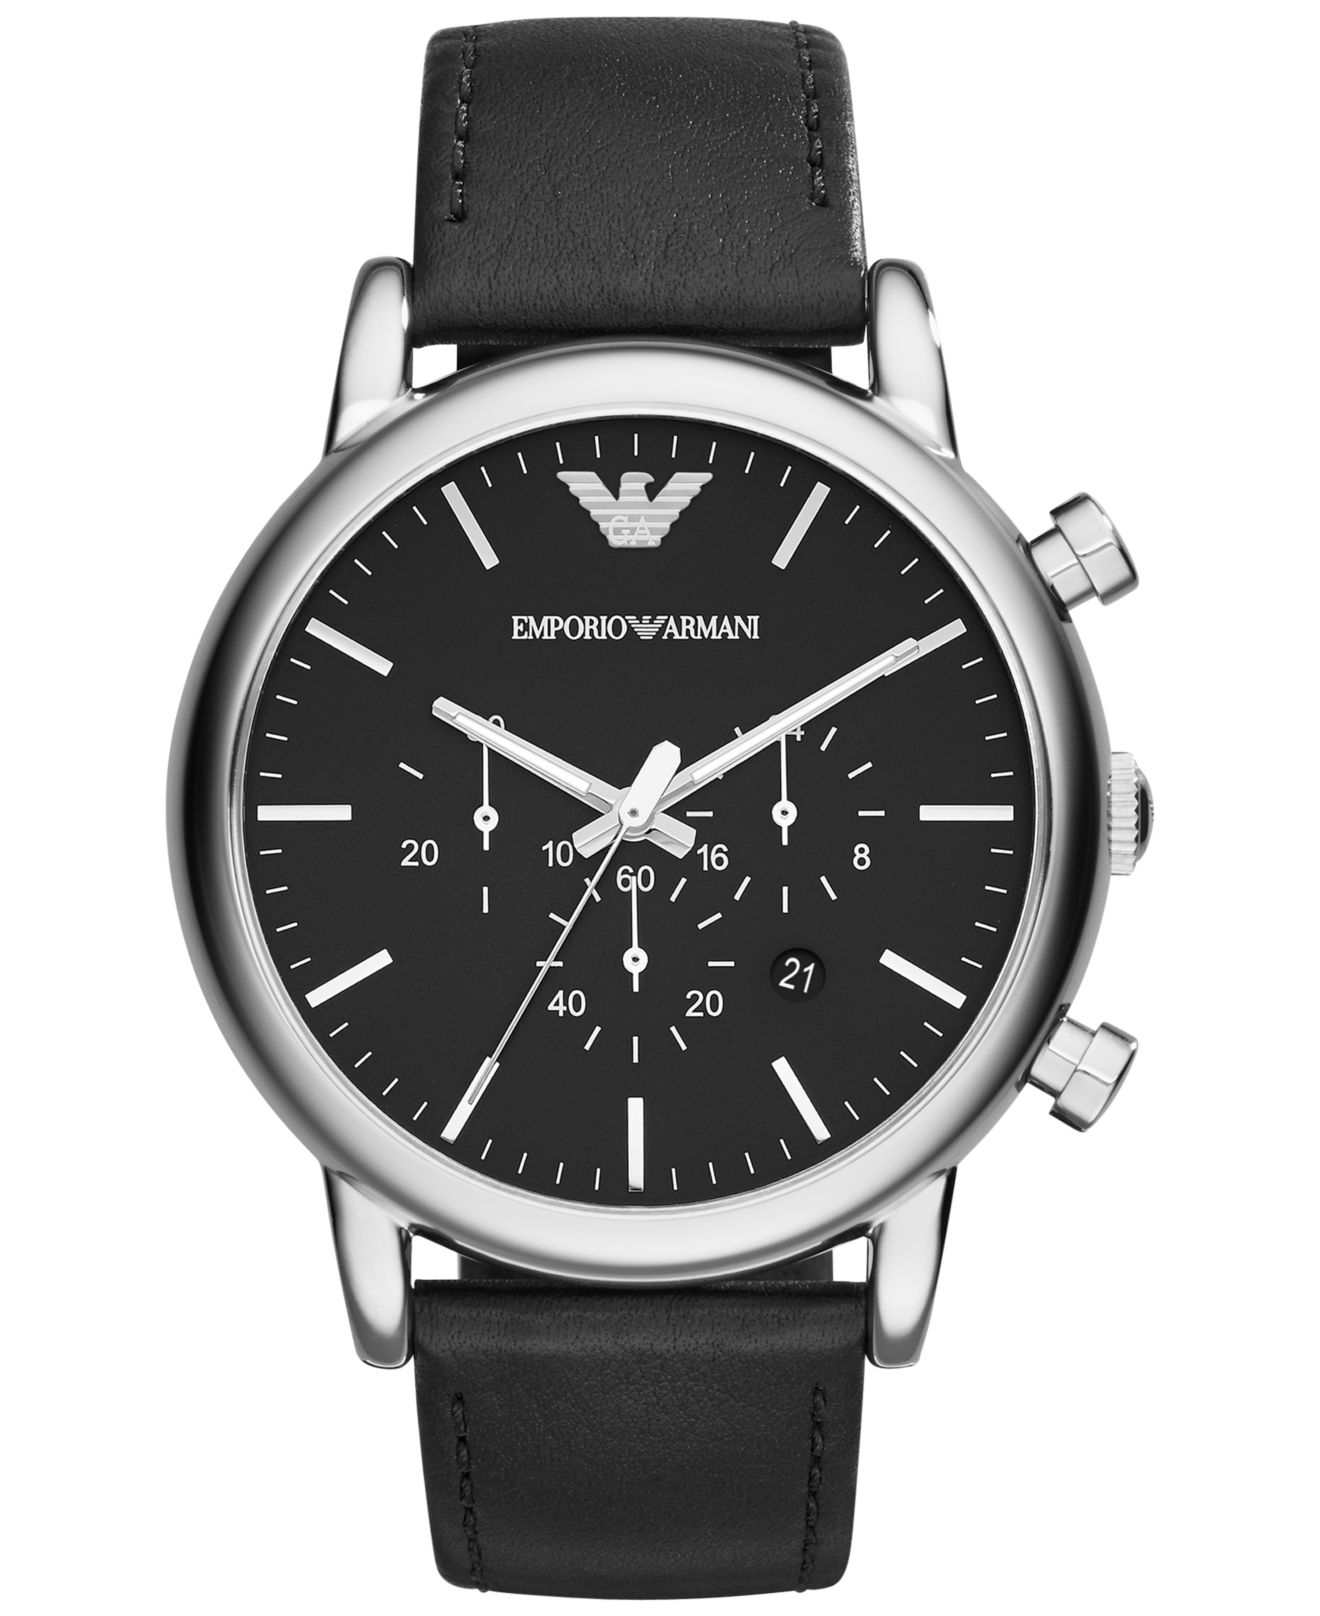 emporio armani men 39 s chronograph matte black leather strap. Black Bedroom Furniture Sets. Home Design Ideas